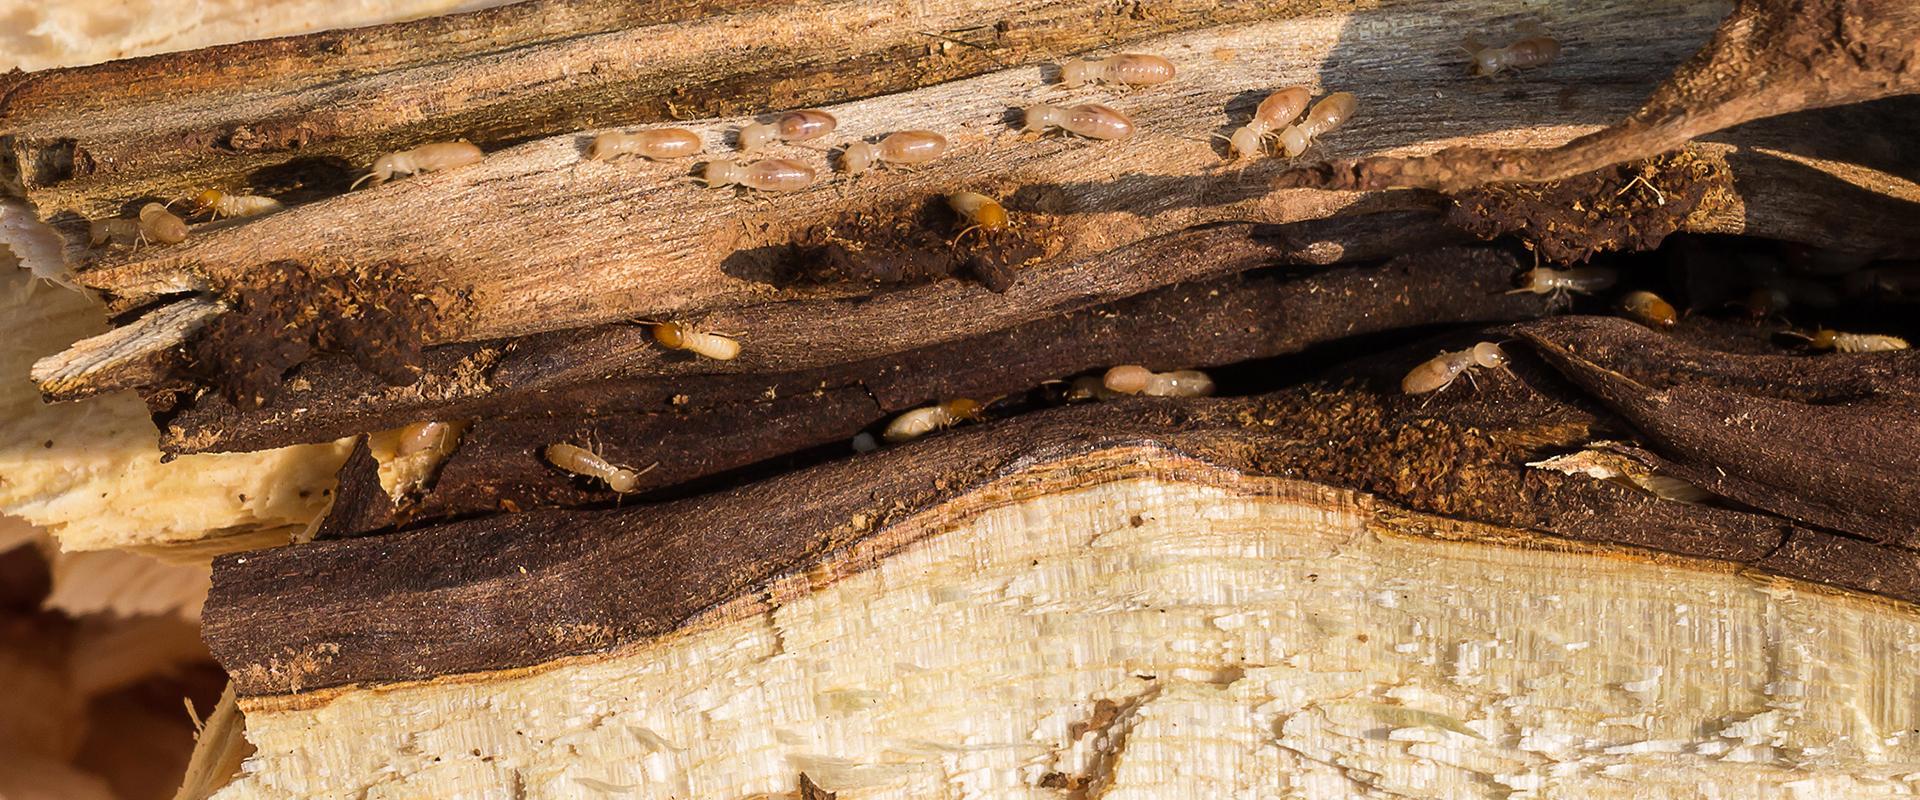 termite colony damaging wood